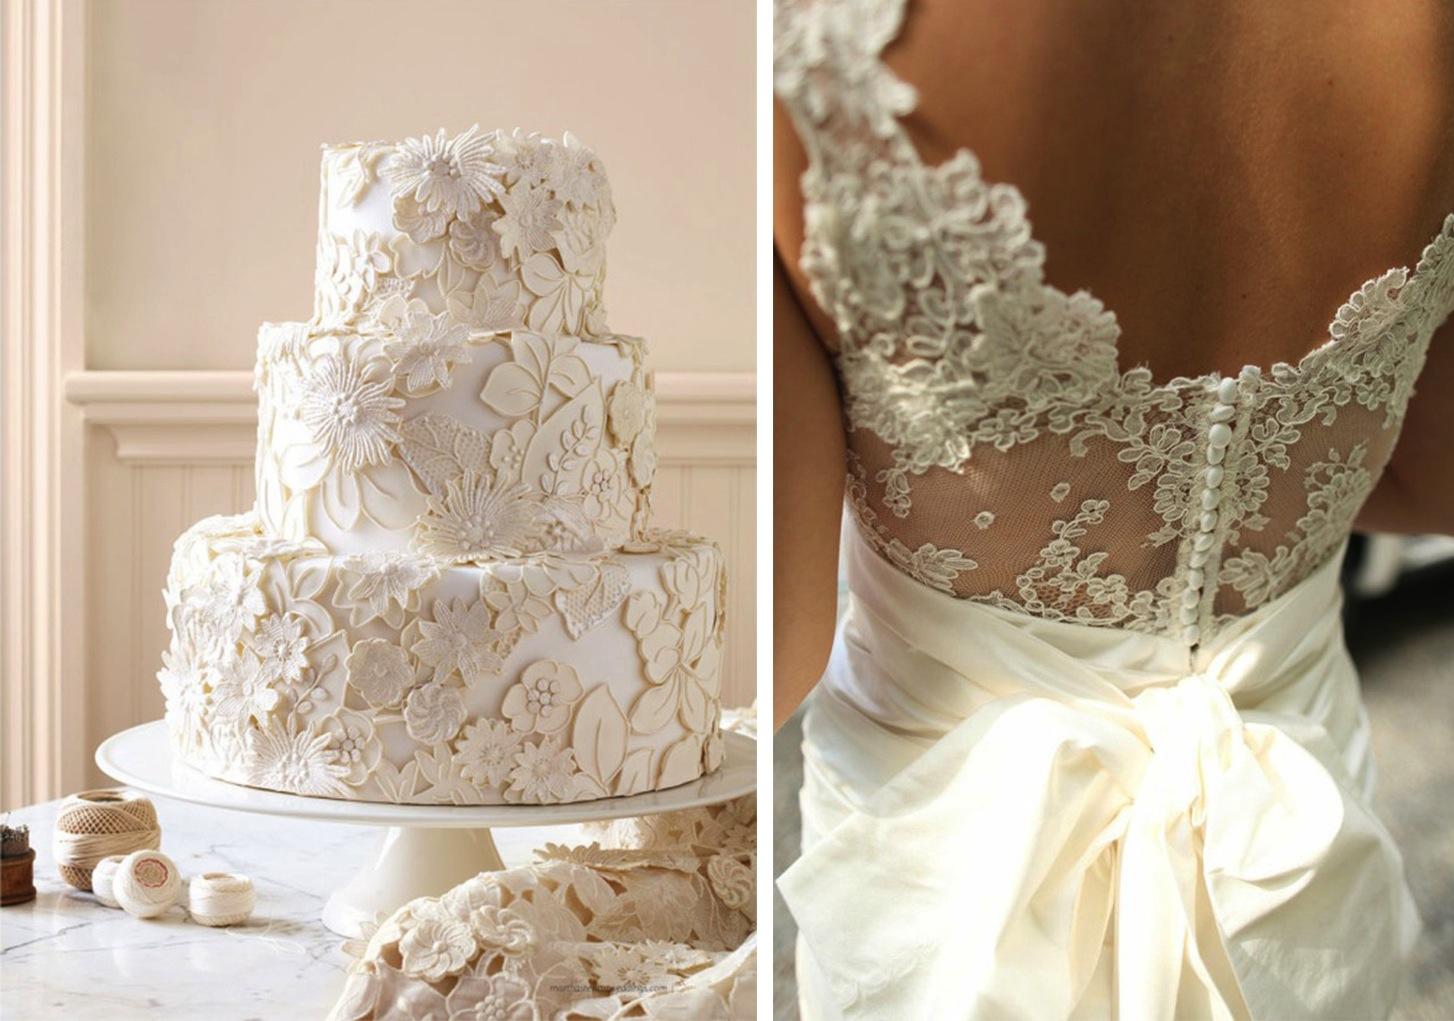 Matrimonio Tema Pizzo : Posto al gusto n matrimonio in pizzo maggiordomus